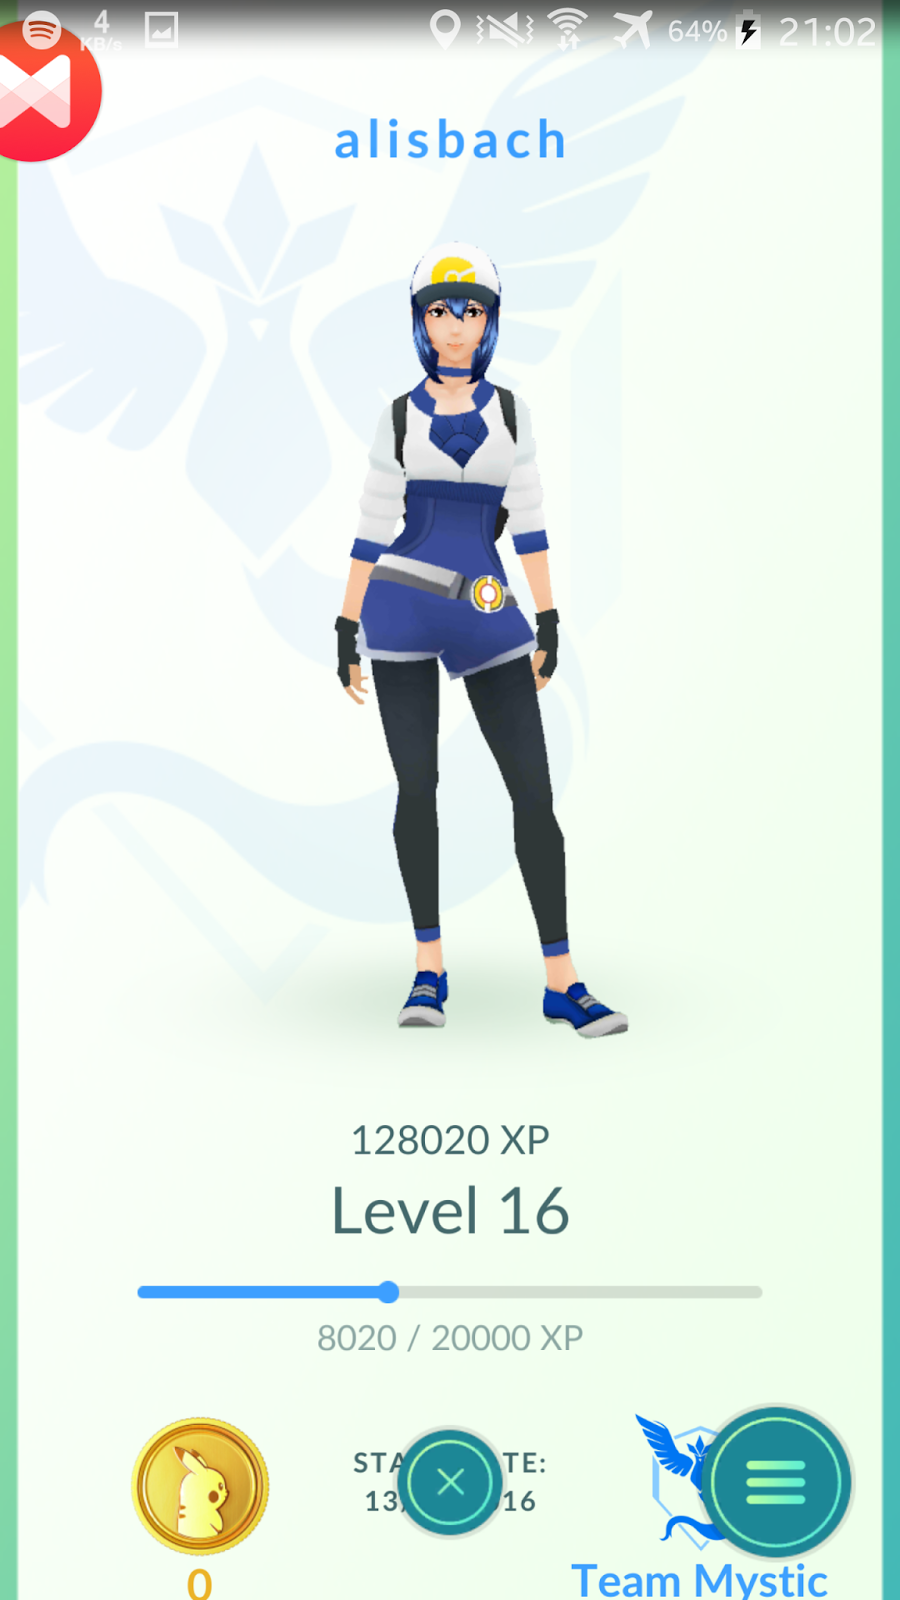 Cara Mengedit Karakter Avatar Pokemon Go - Alisbach